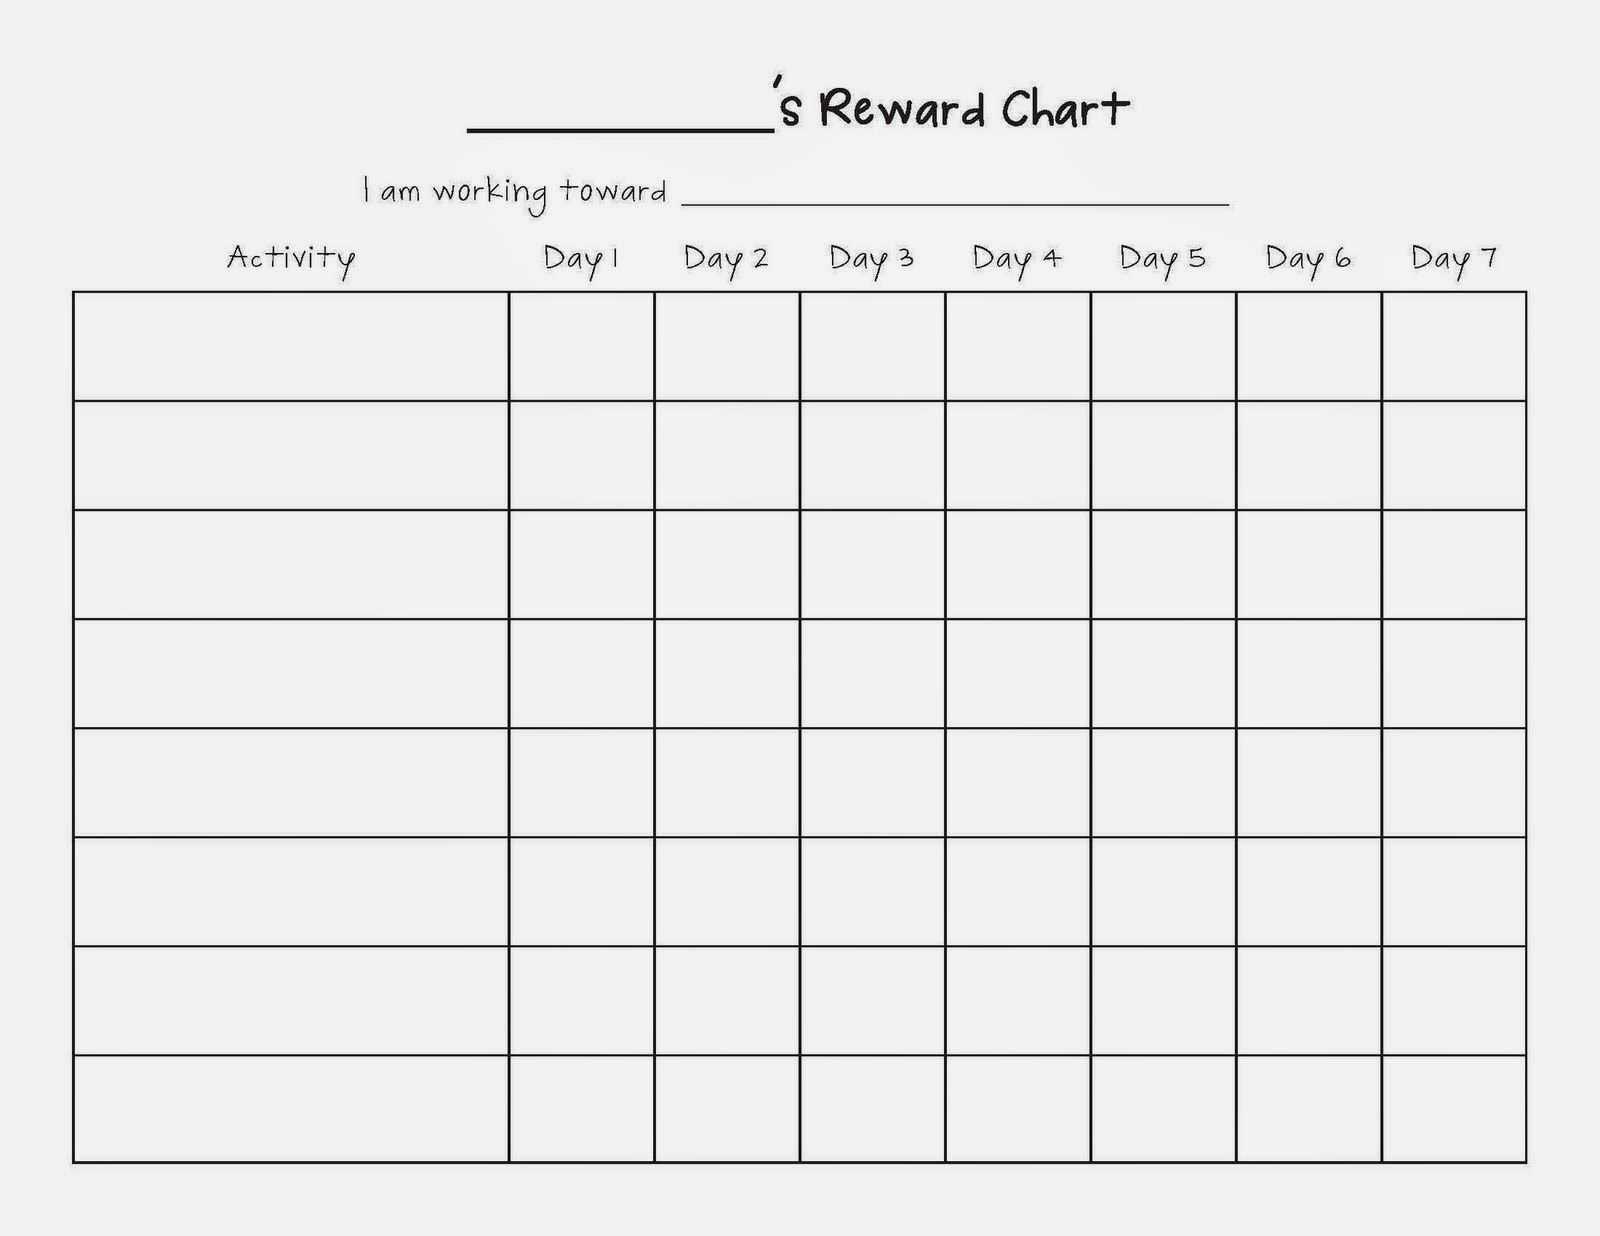 Image Result For Blank Sticker Charts | Reward Chart Intended For Blank Reward Chart Template